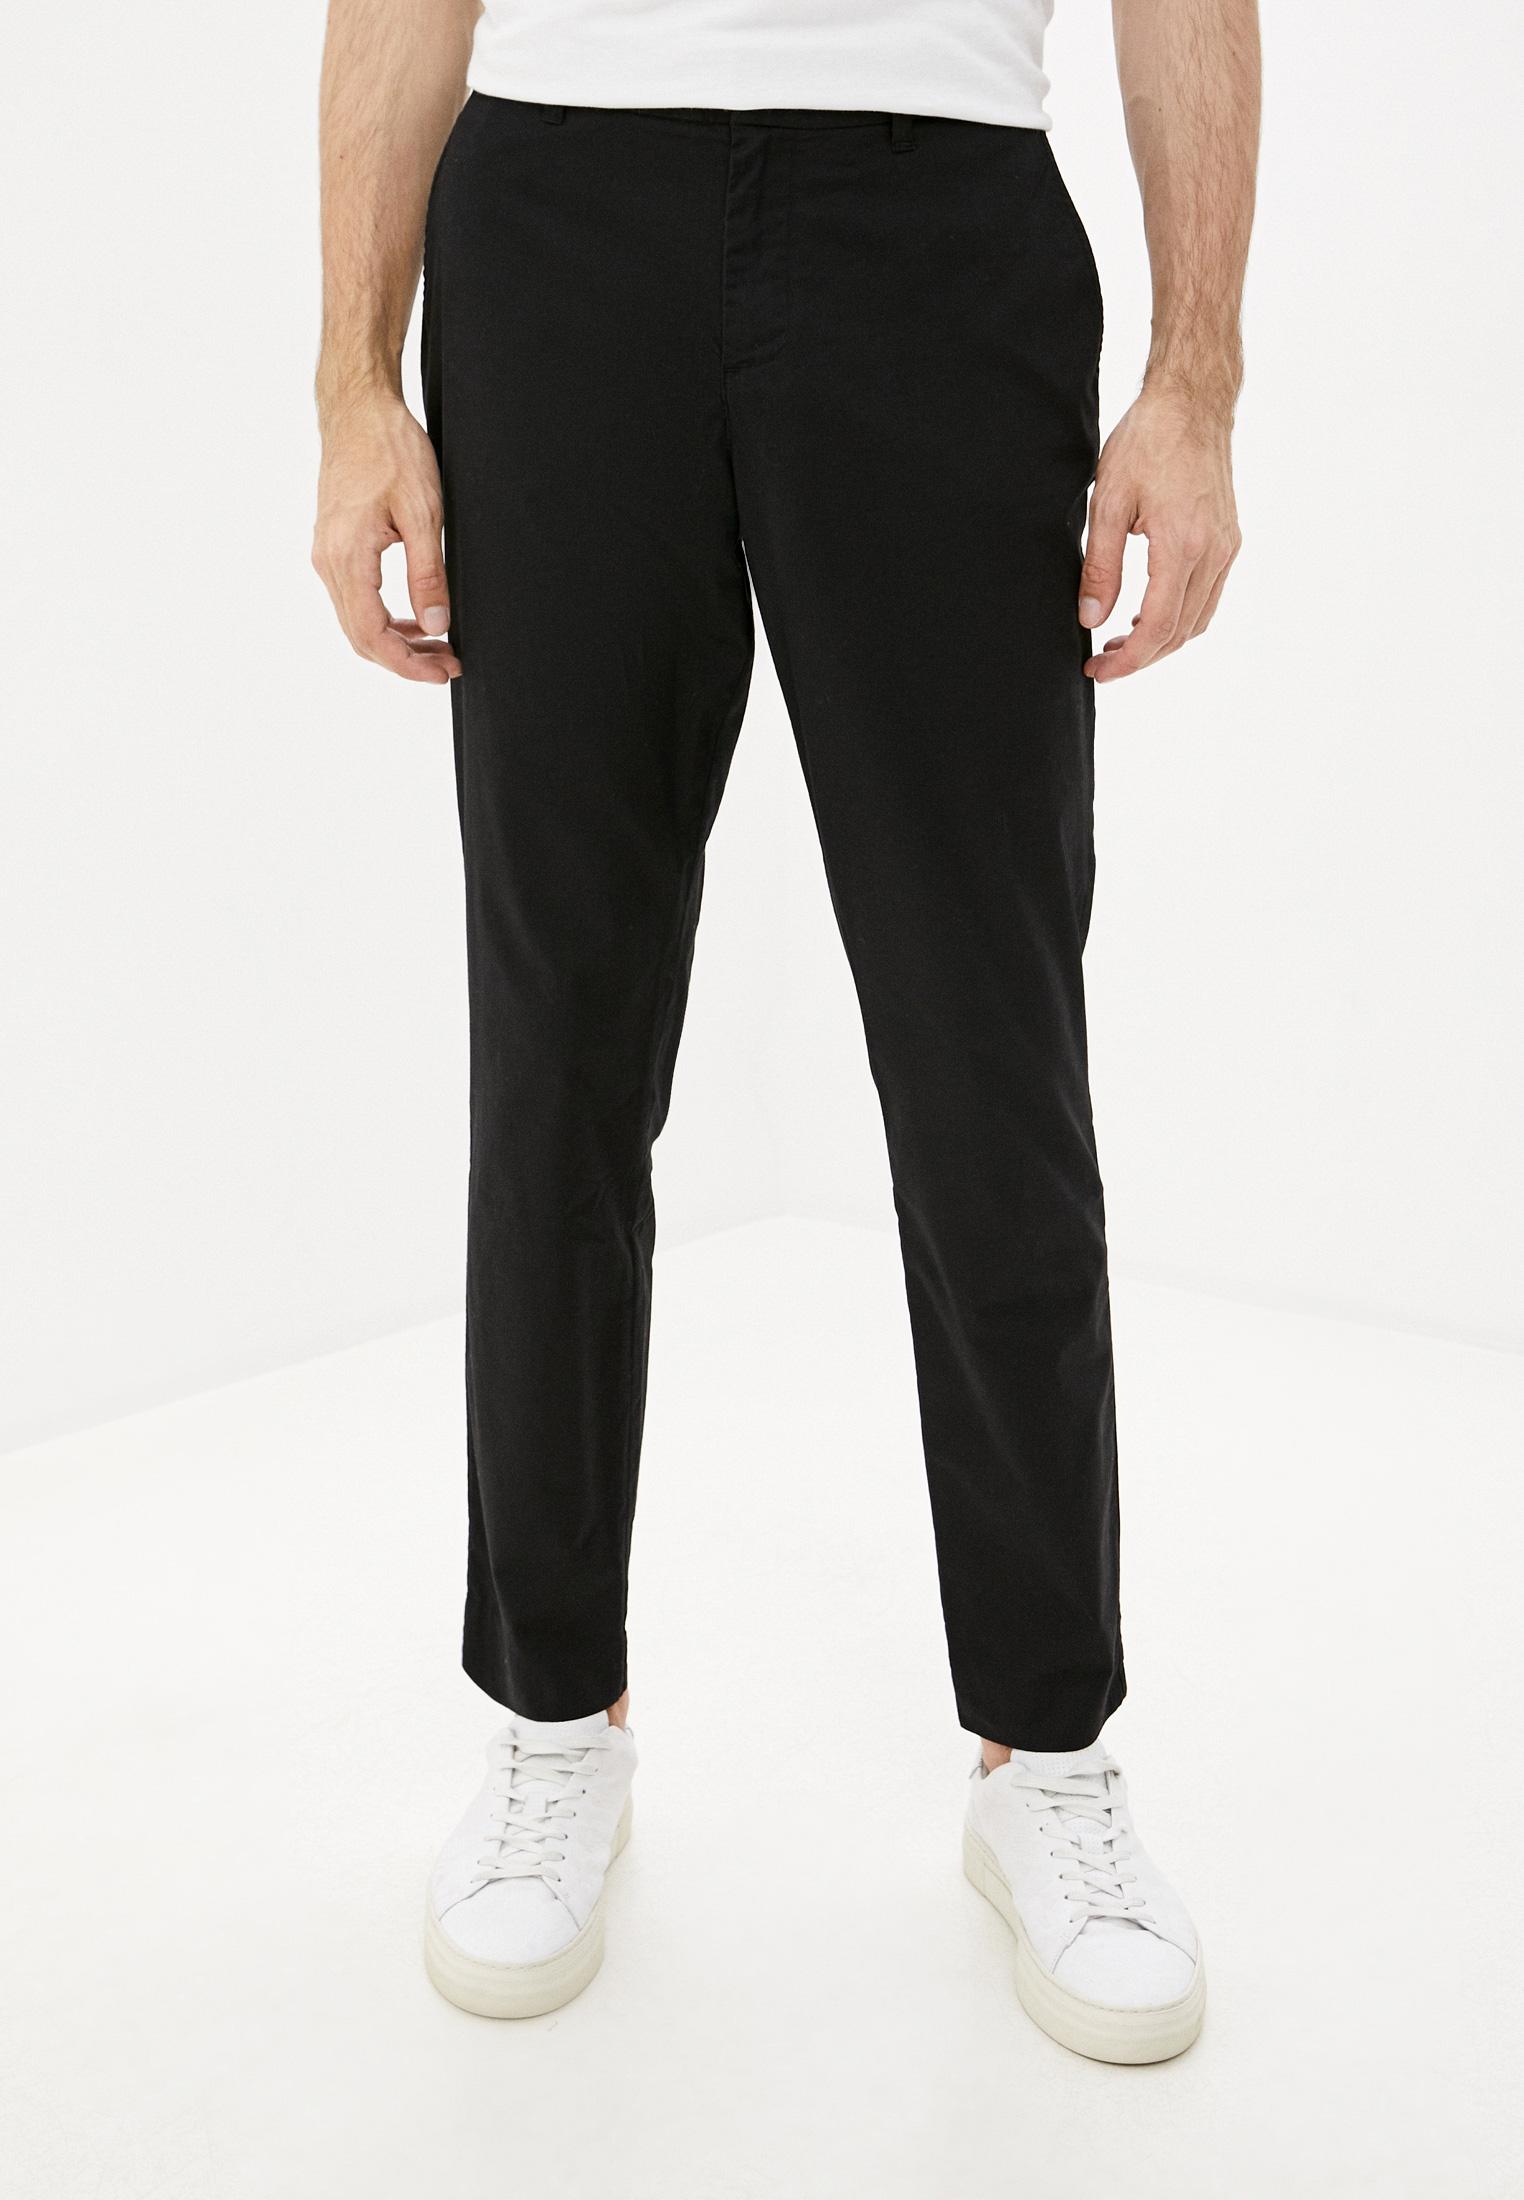 Мужские повседневные брюки Finn Flare (Фин Флаер) A19-42018